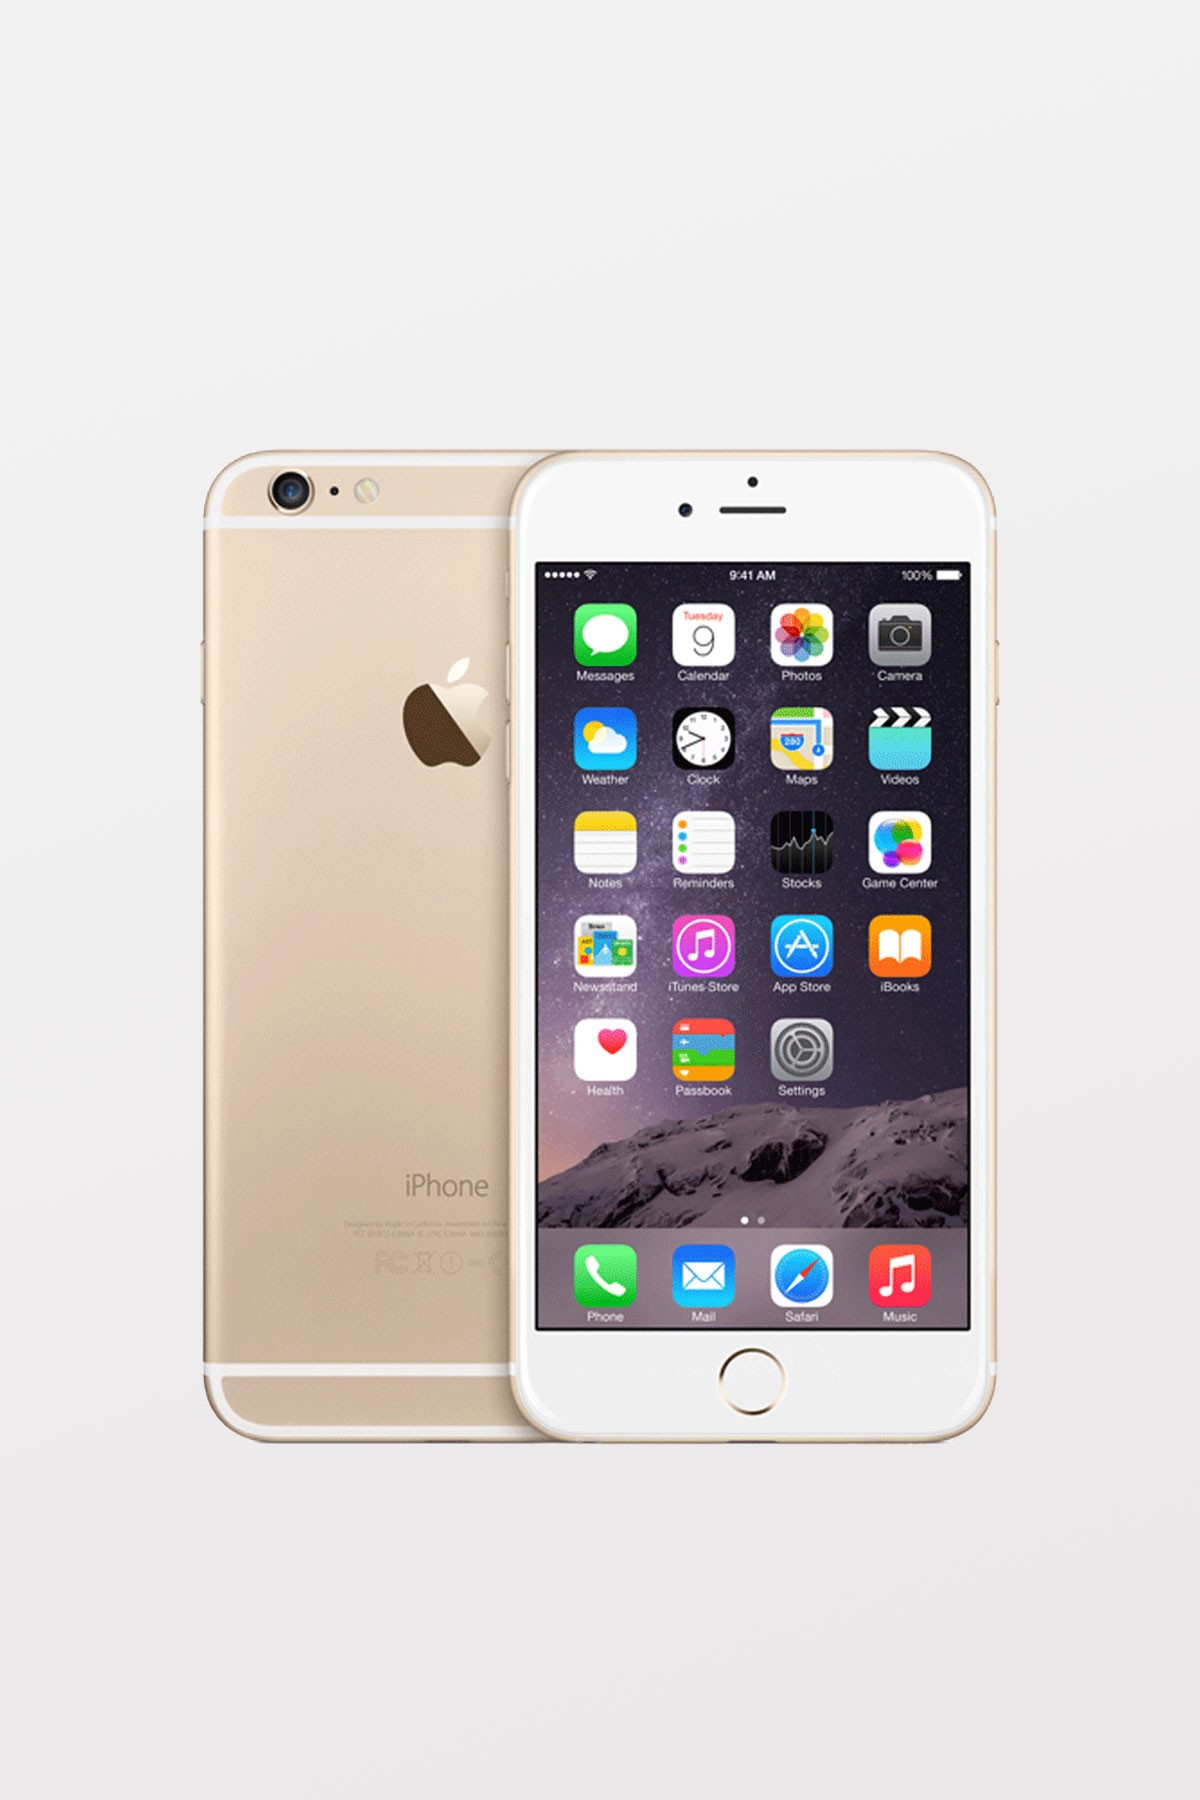 Apple iPhone 6 Plus 16GB - Gold - Refurbished